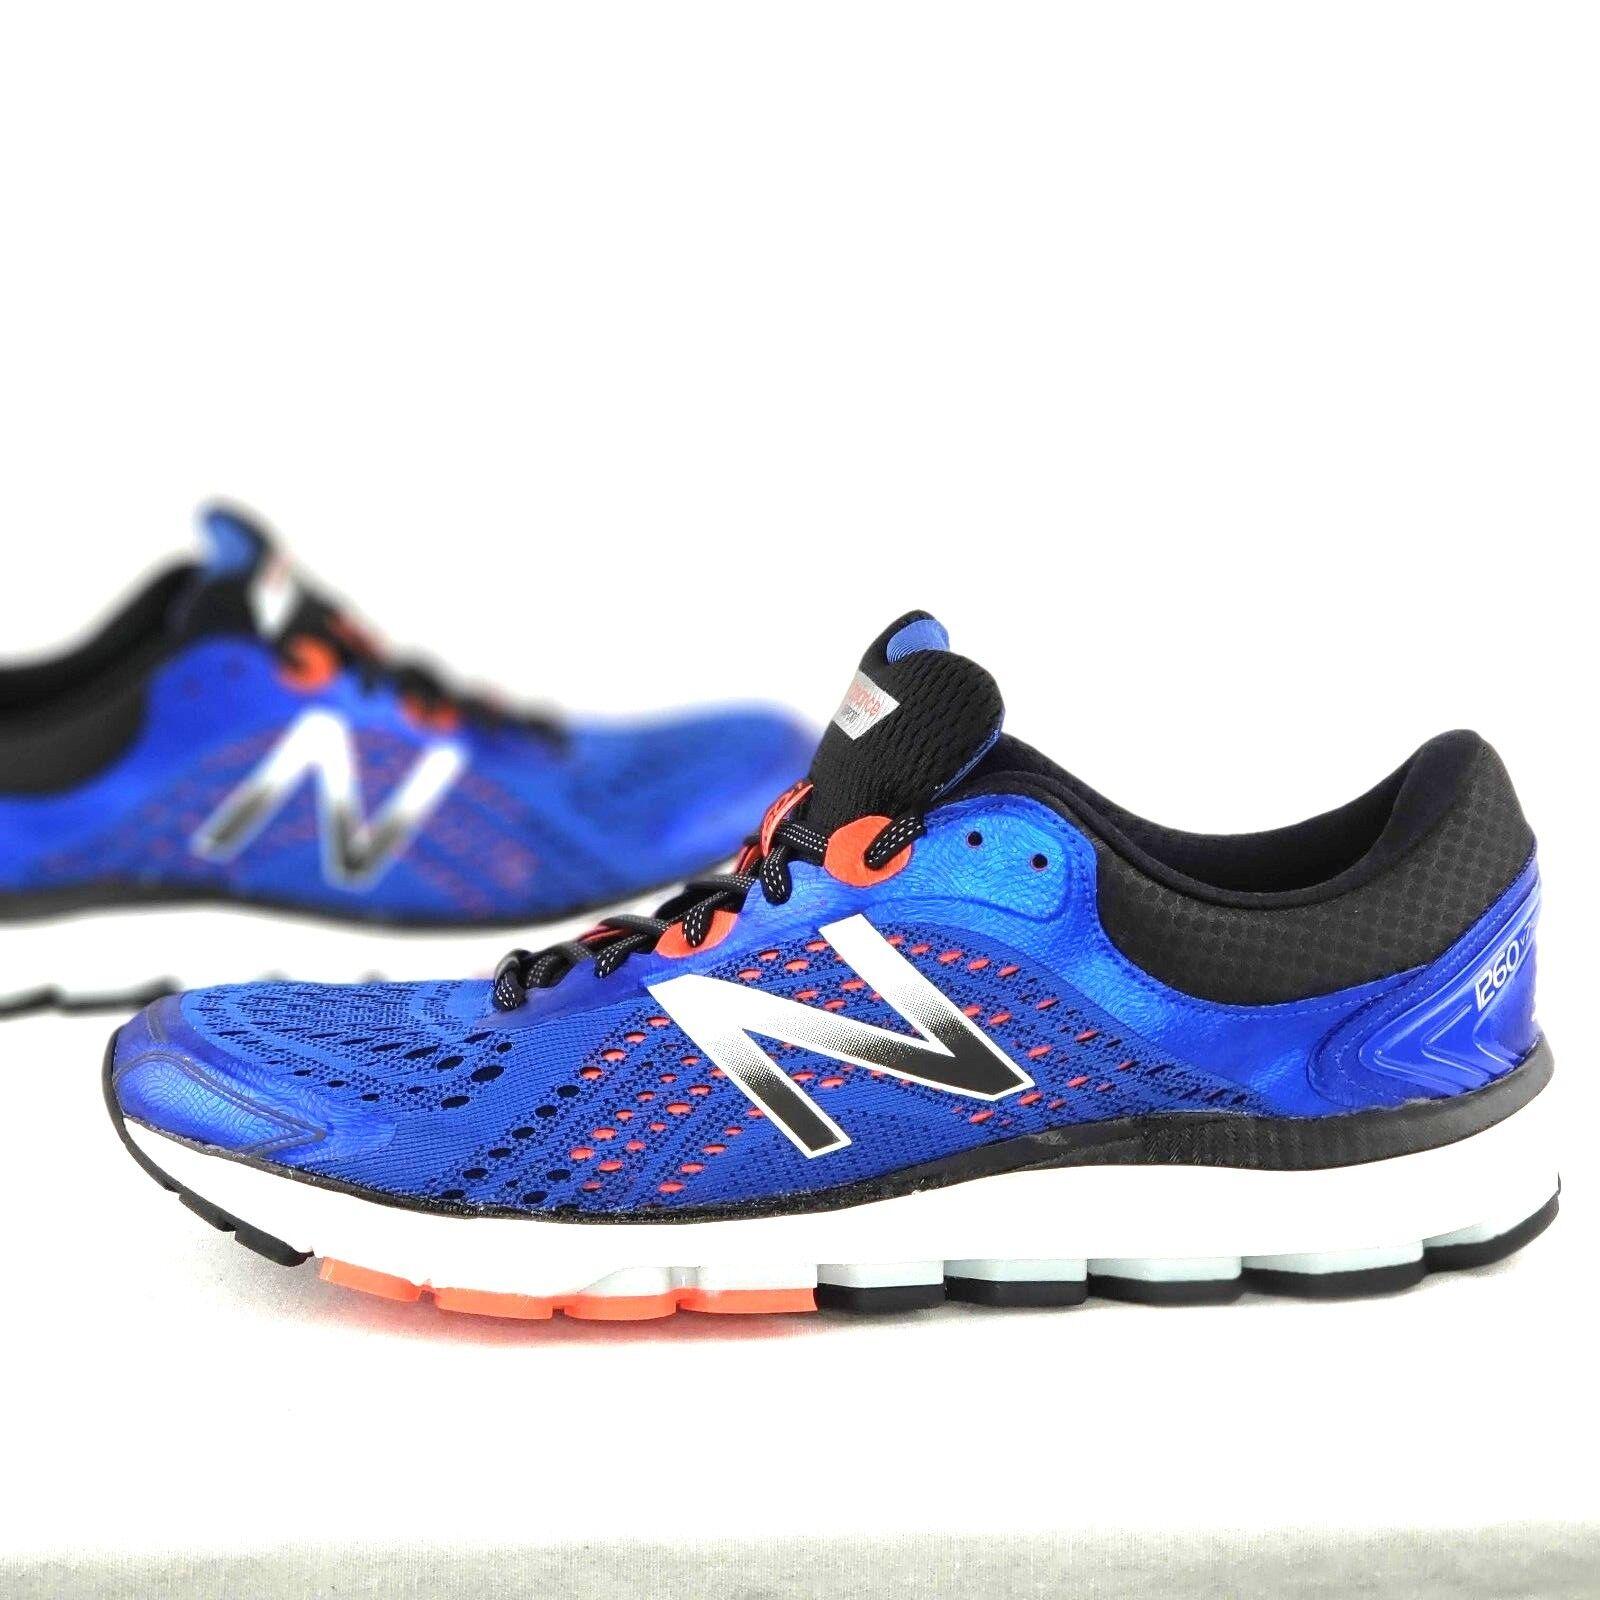 6cdc5a9a5b036 New Balance 1260v7 Mens Pacific bluee Running shoes shoes shoes M1260BO7 Sz  12.5 6bf5a8